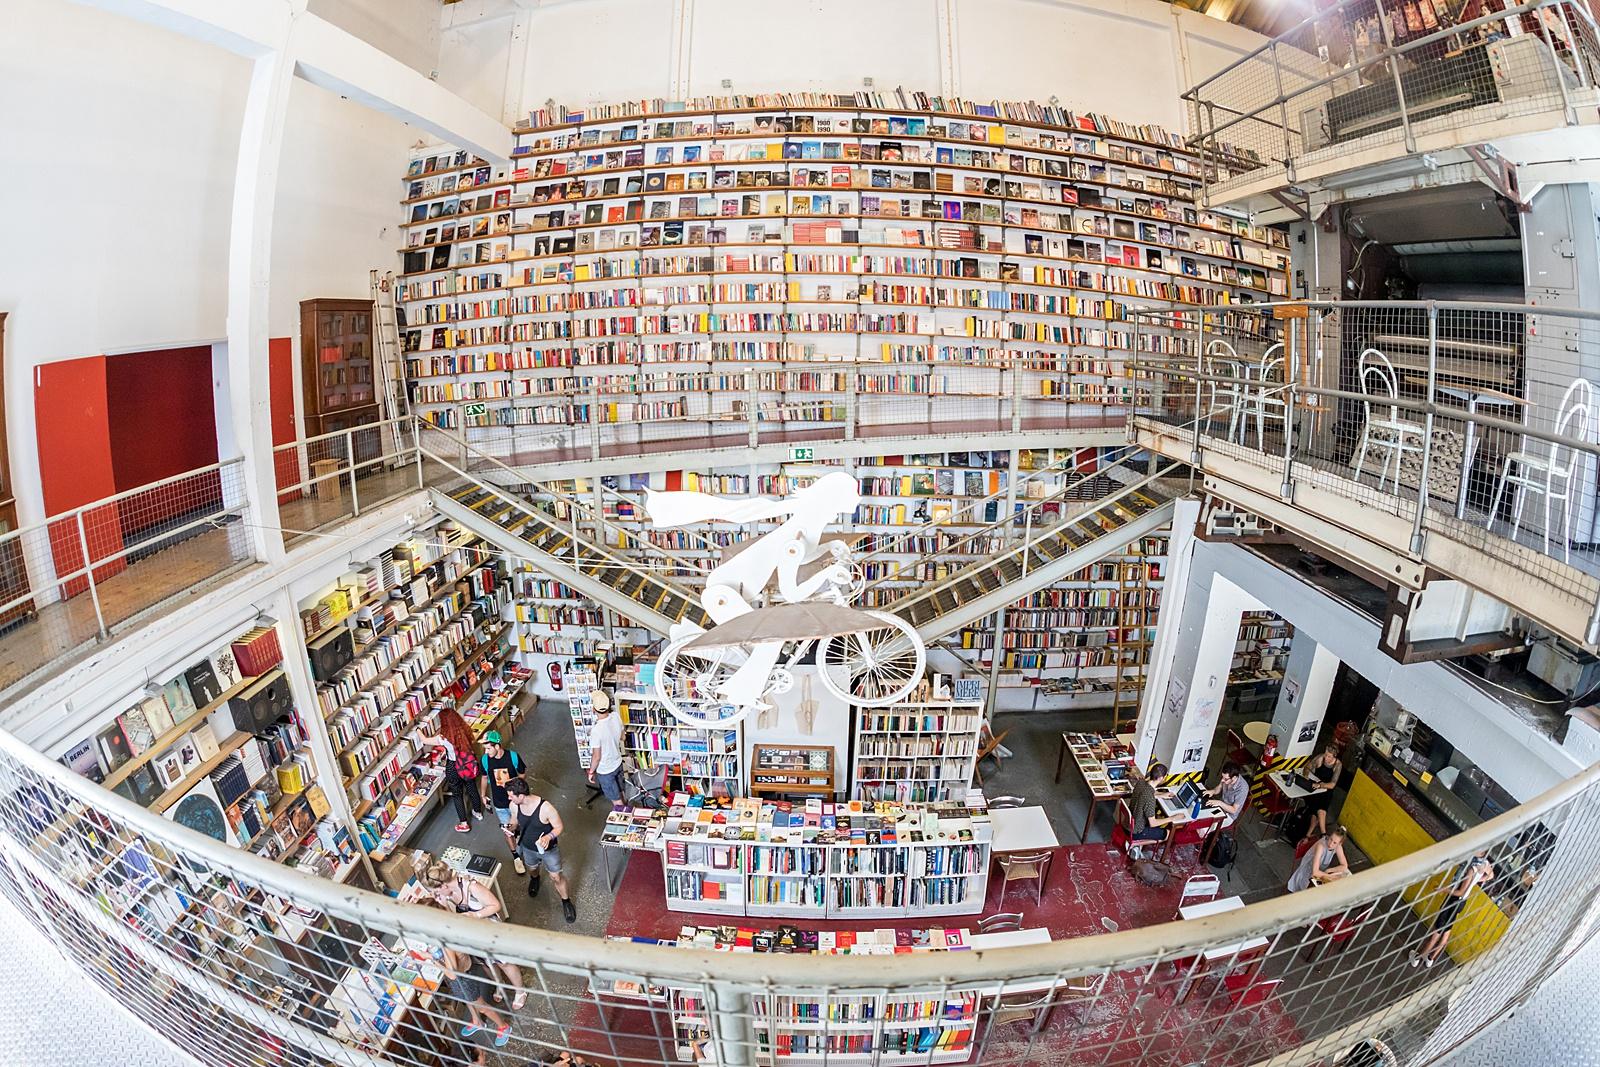 LX Factory, Ler Devagar Bookstore